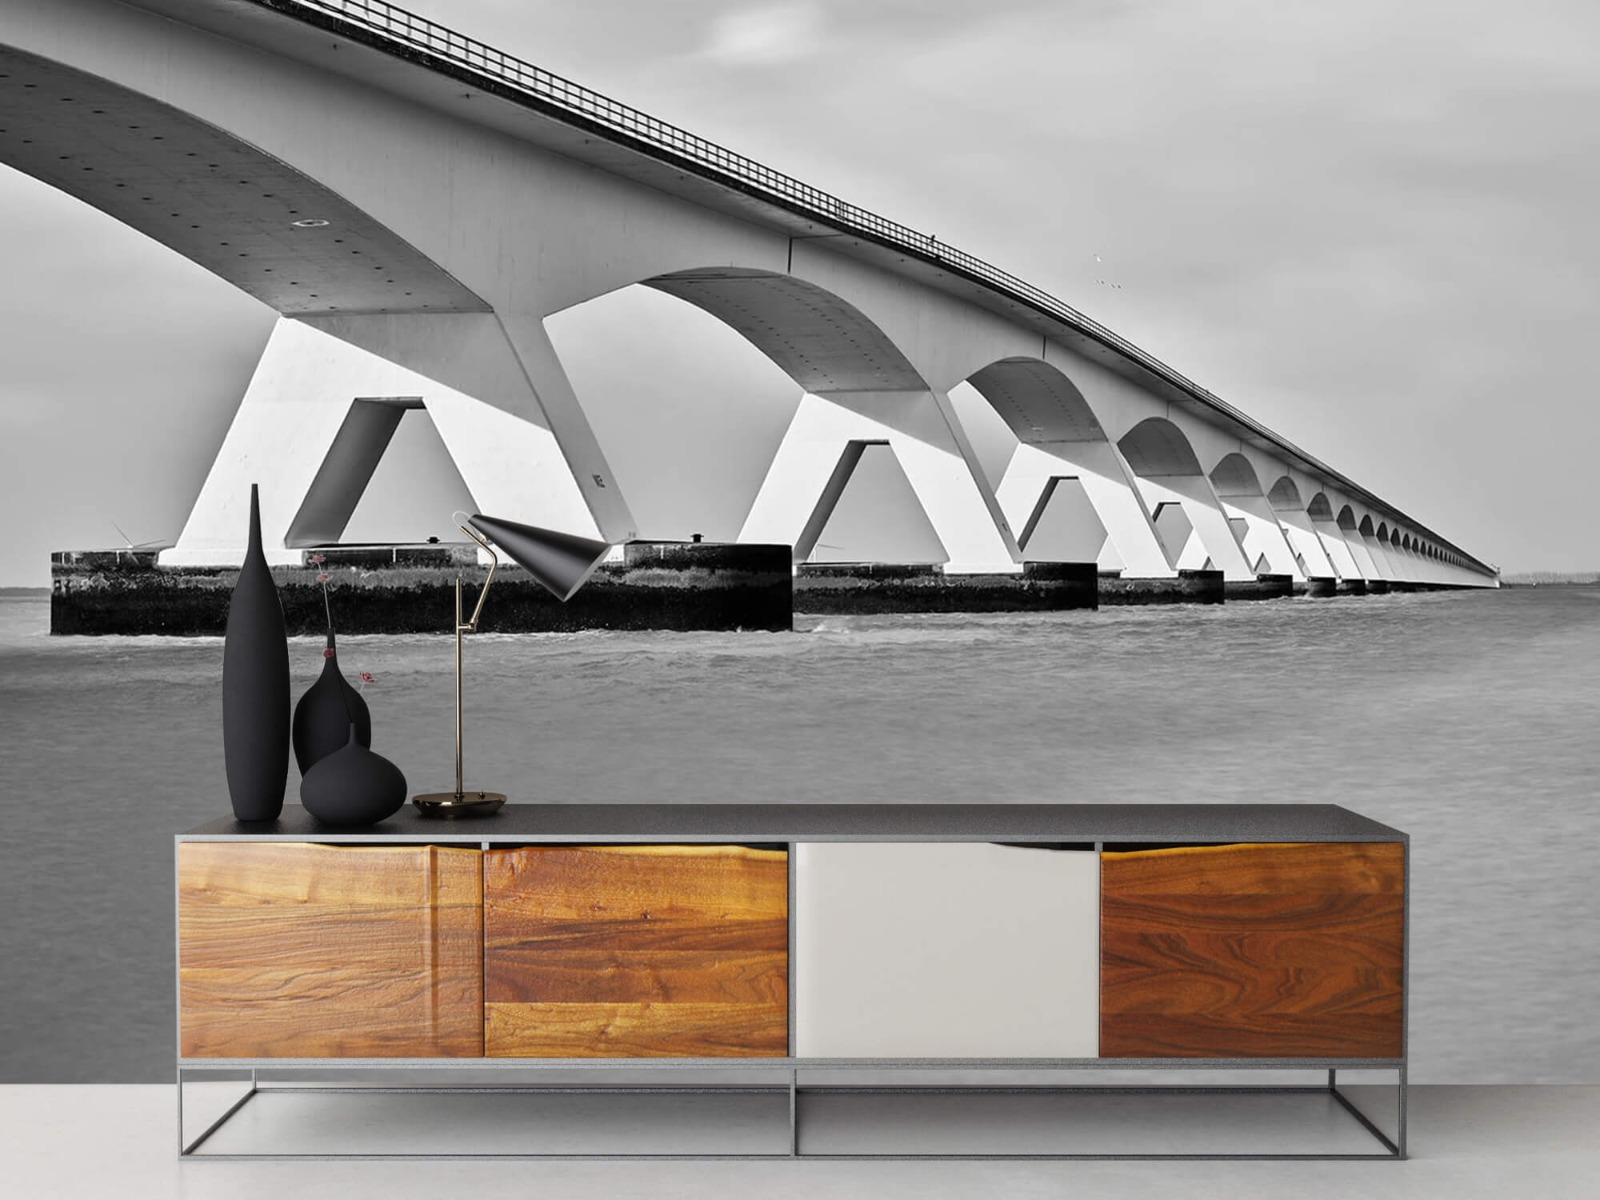 Zwart Wit behang - Lange brug - Kantoor 17